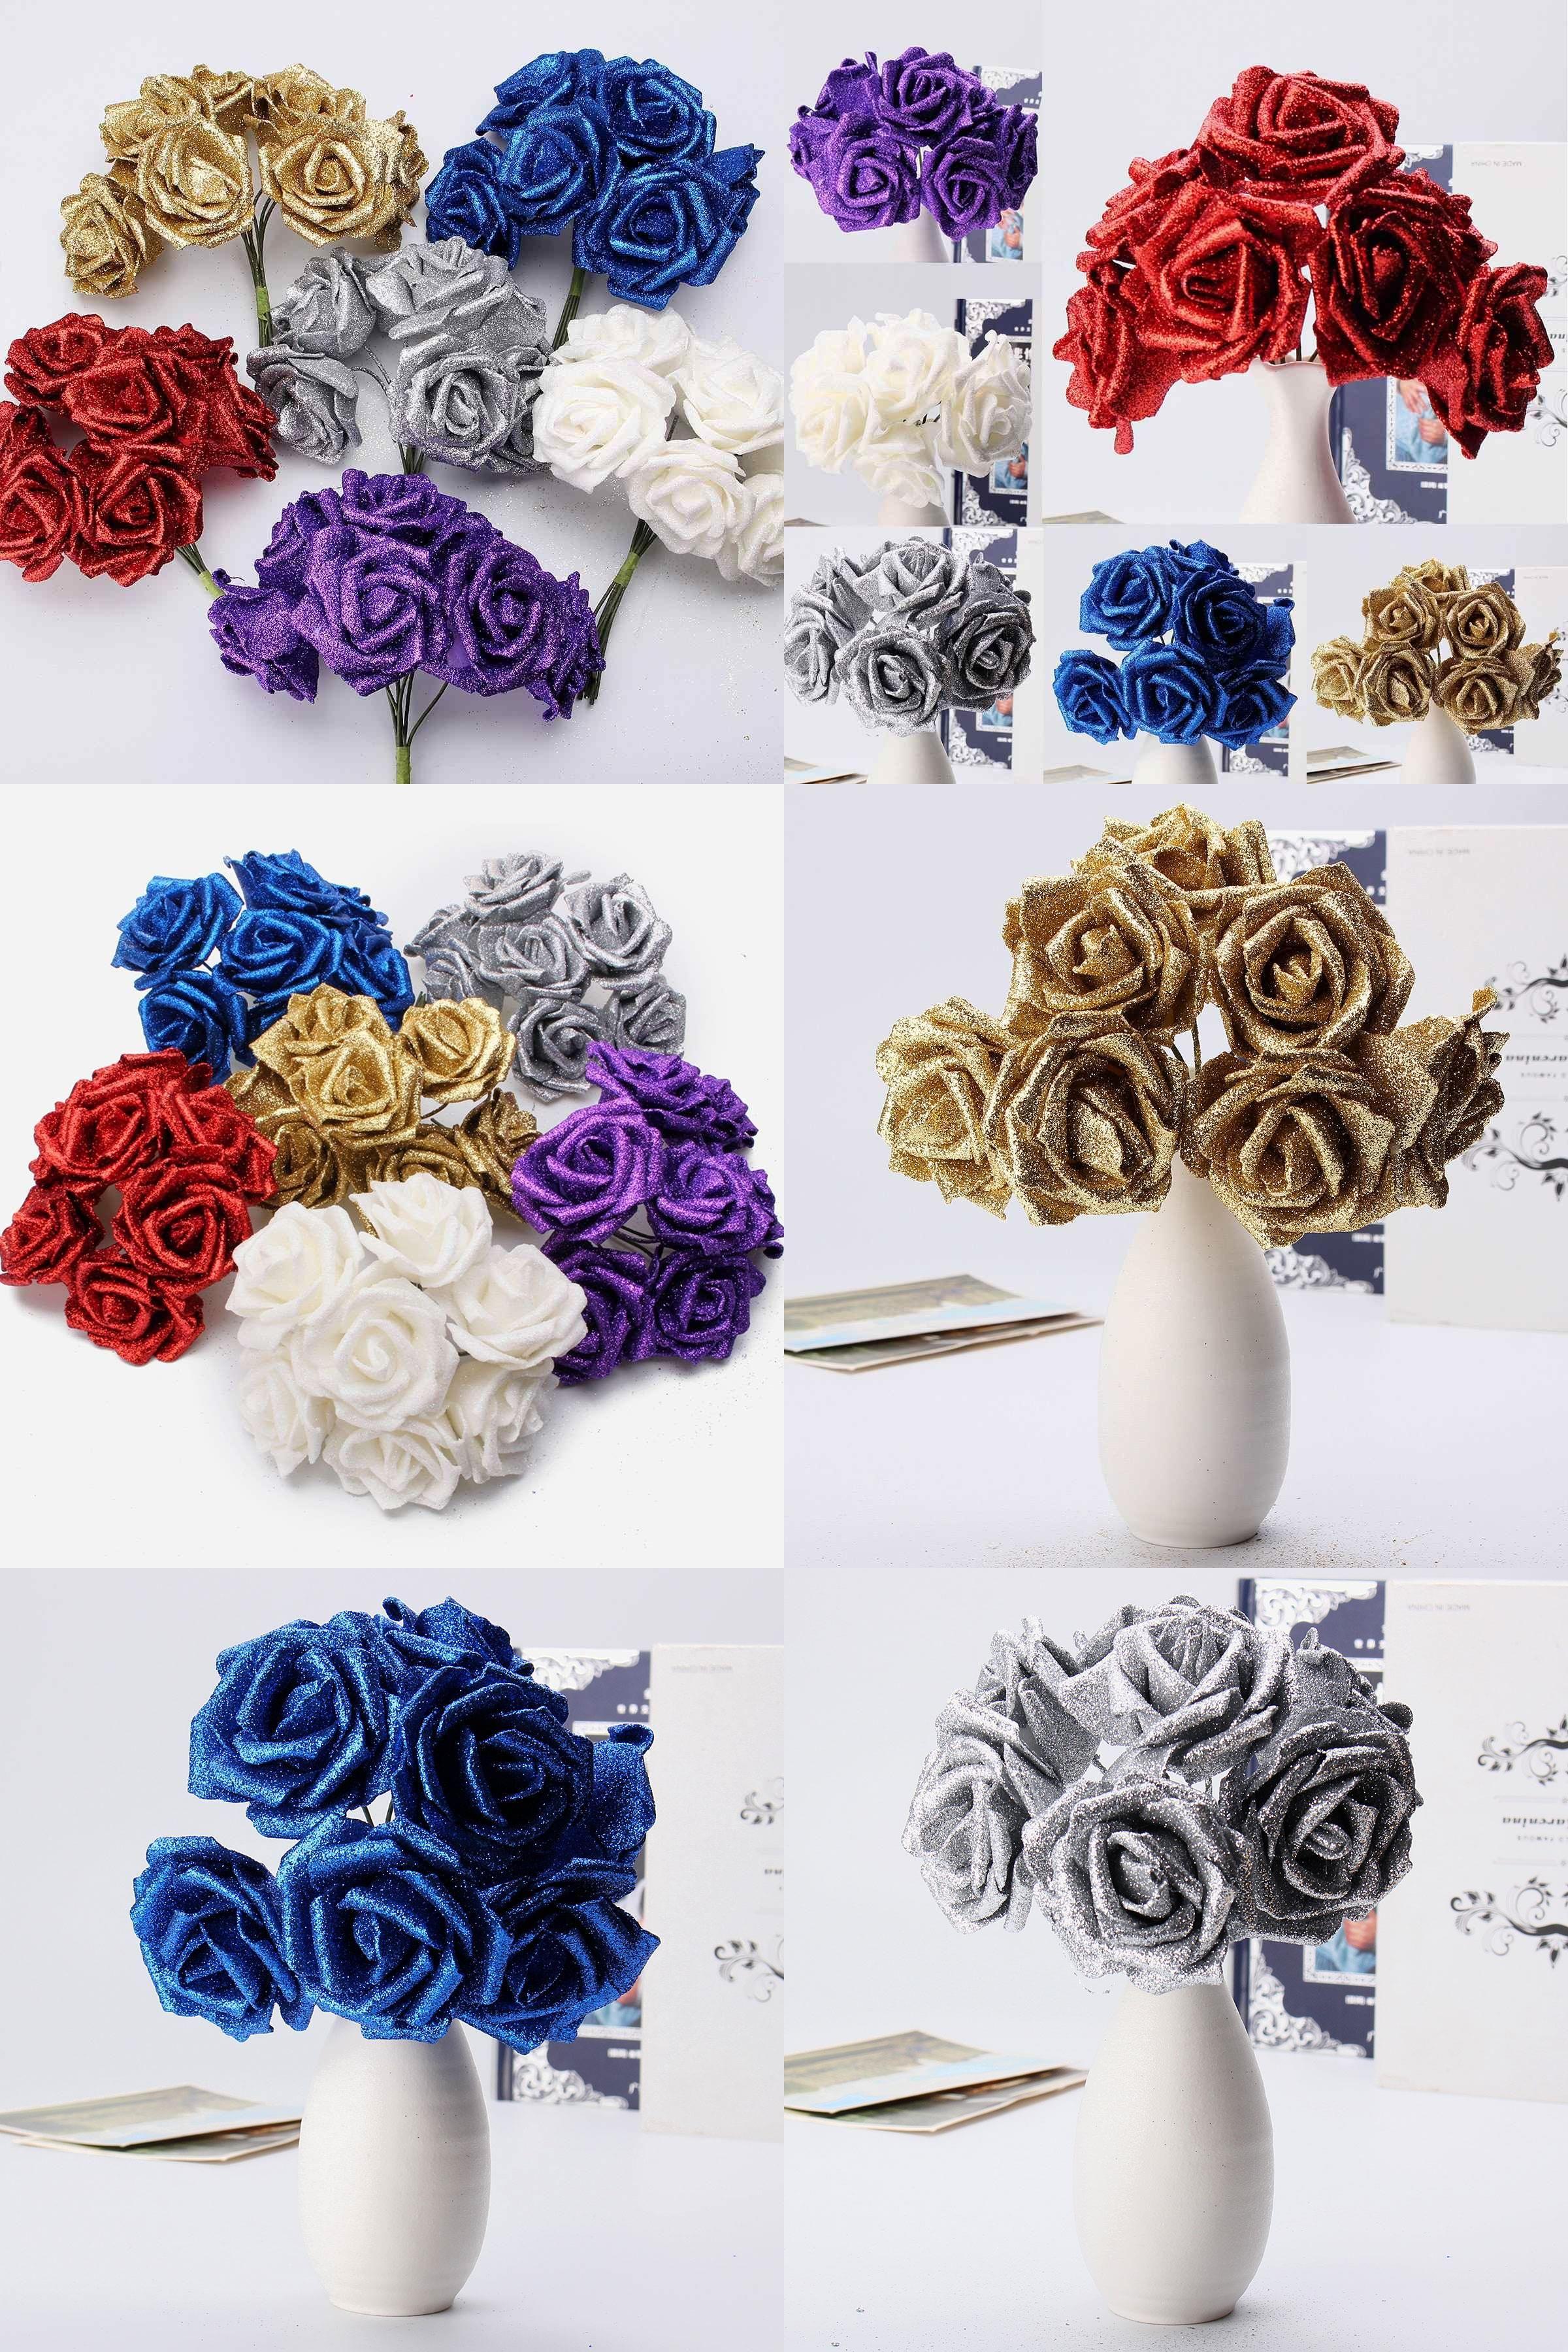 Visit to buy charming wedding bridal flower bouquet 7 headsbunch visit to buy charming wedding bridal flower bouquet 7 headsbunch foam glitter izmirmasajfo Choice Image